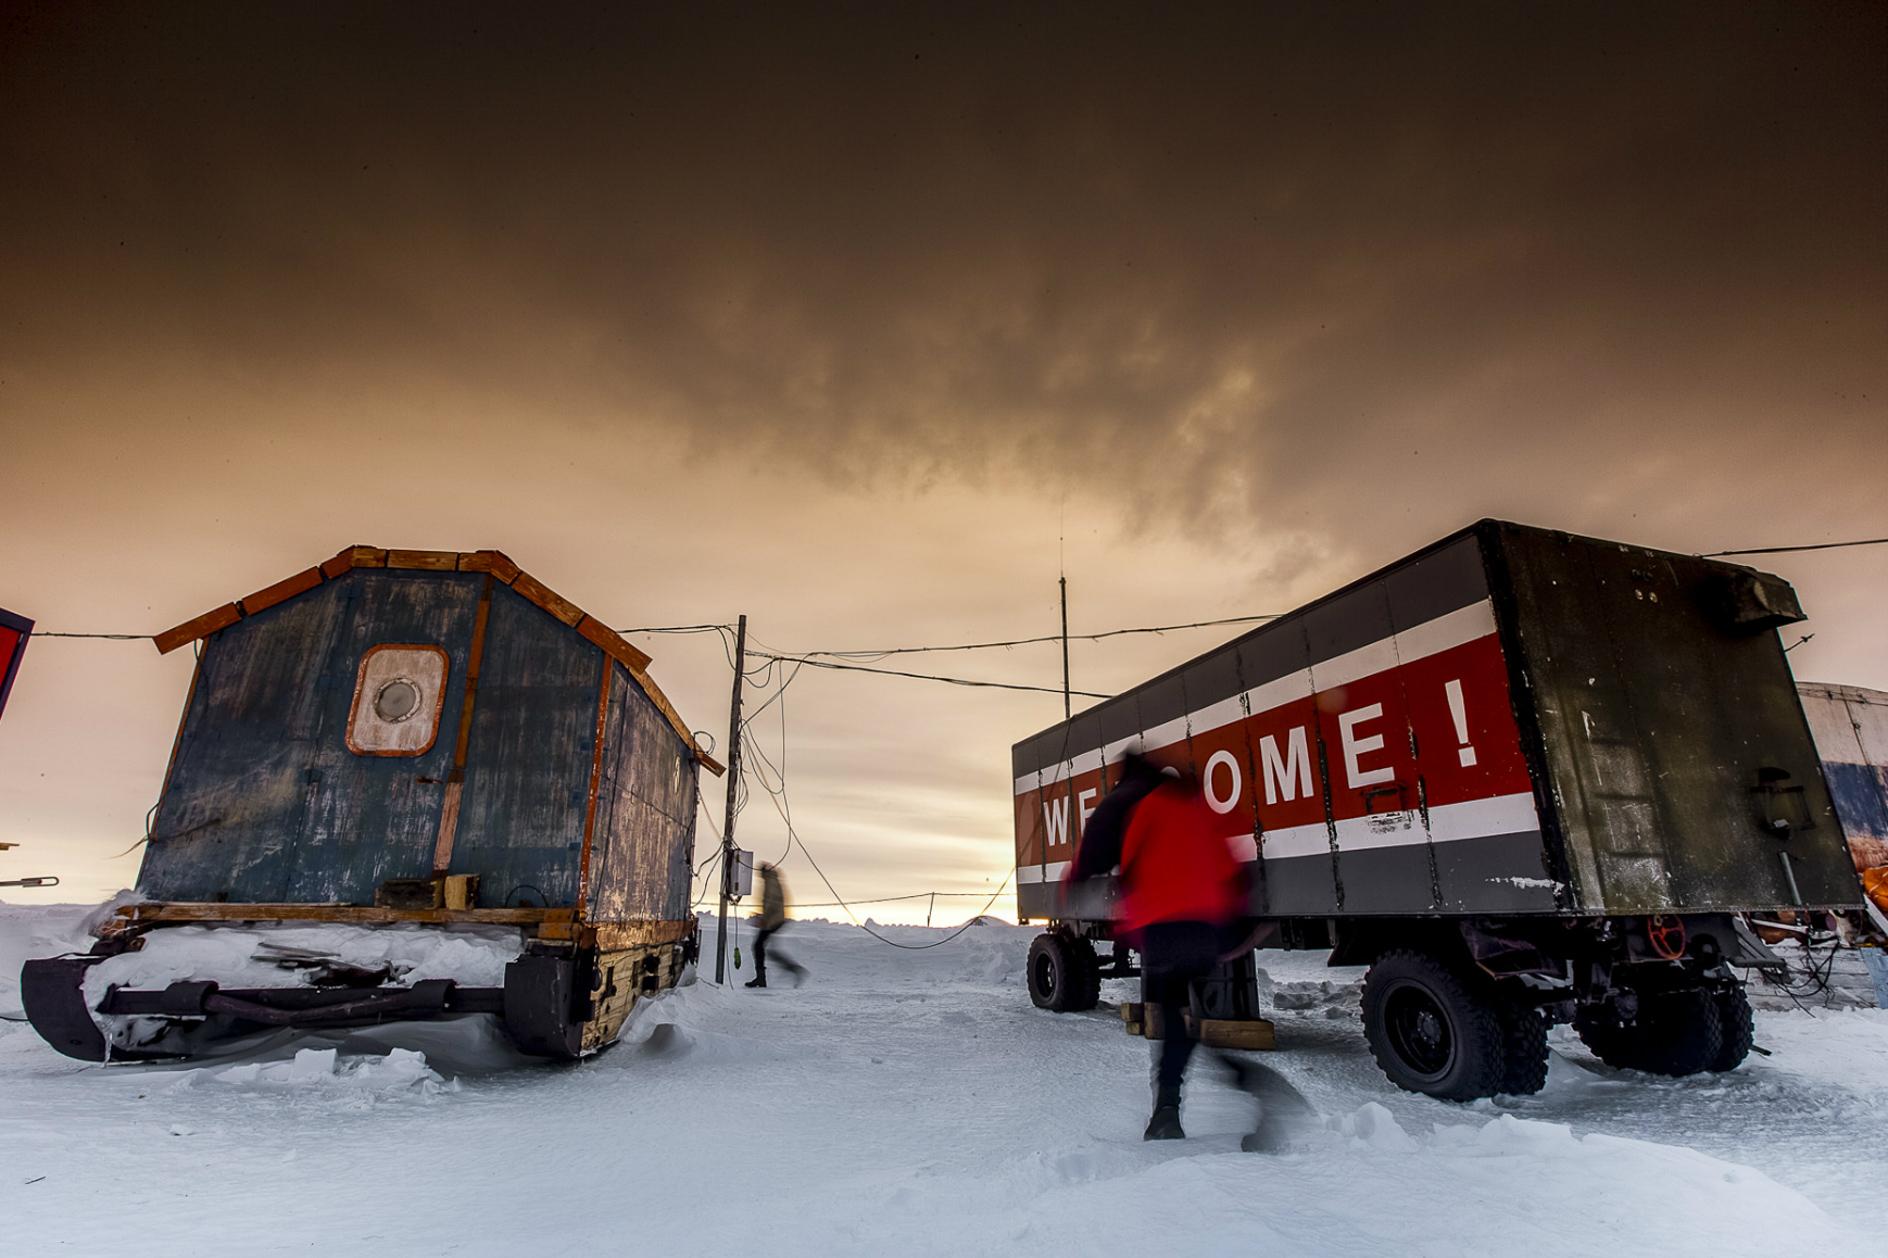 Cory-Richards-Photographer-Antarctica-14.jpg